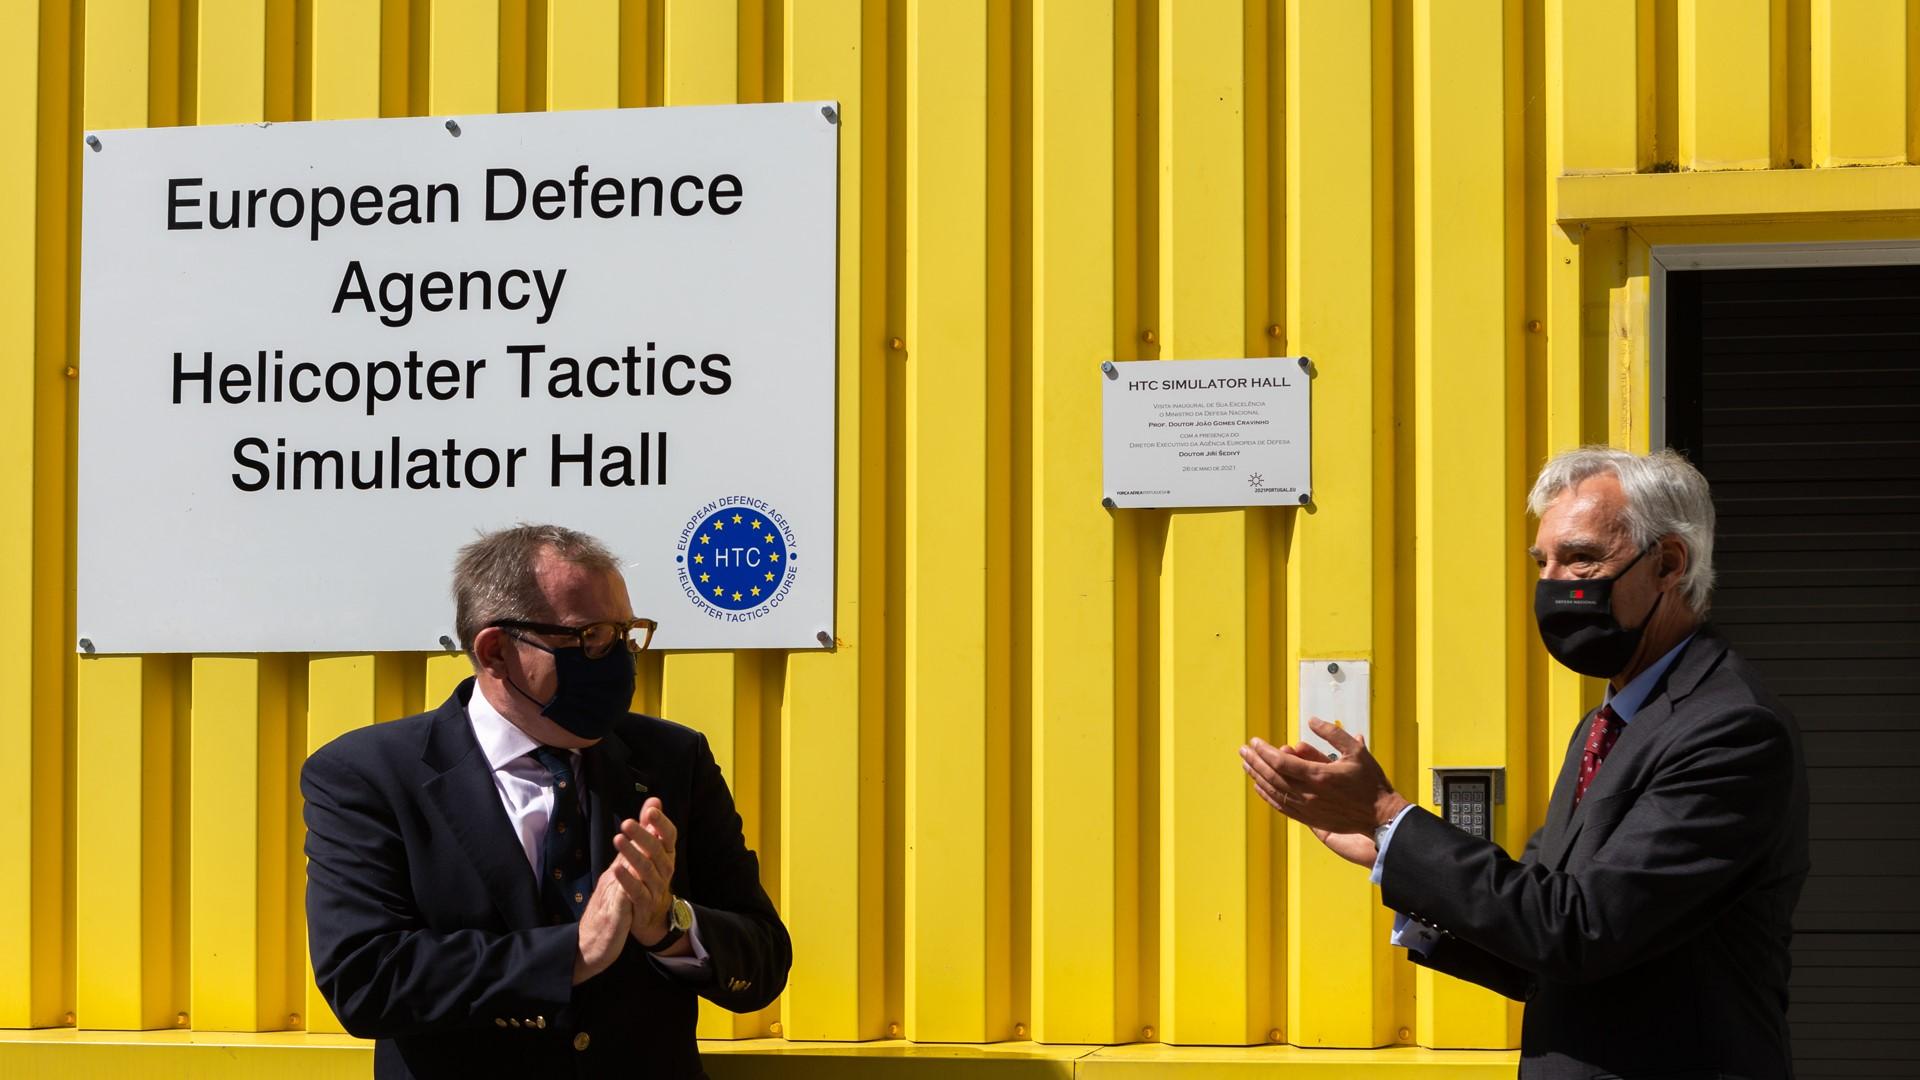 New EDA helicopter training simulator inaugurated